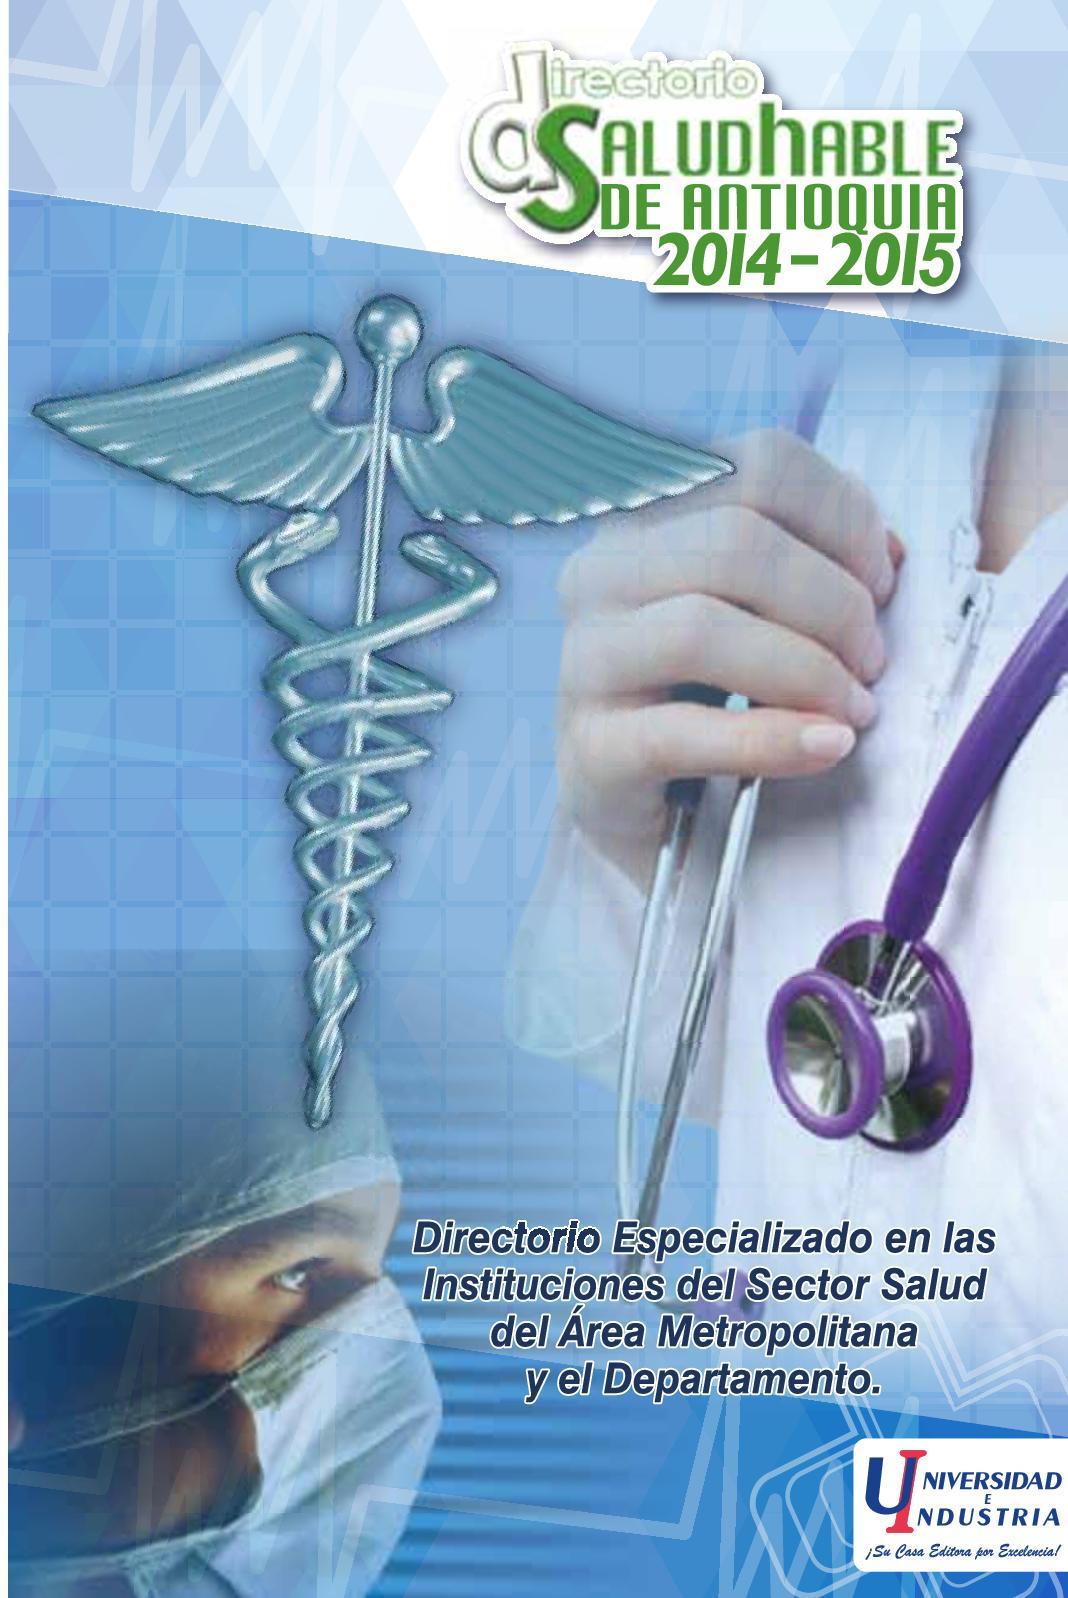 Resonancia magnética multiparamétrica del hospital de próstata Padre Pio Para